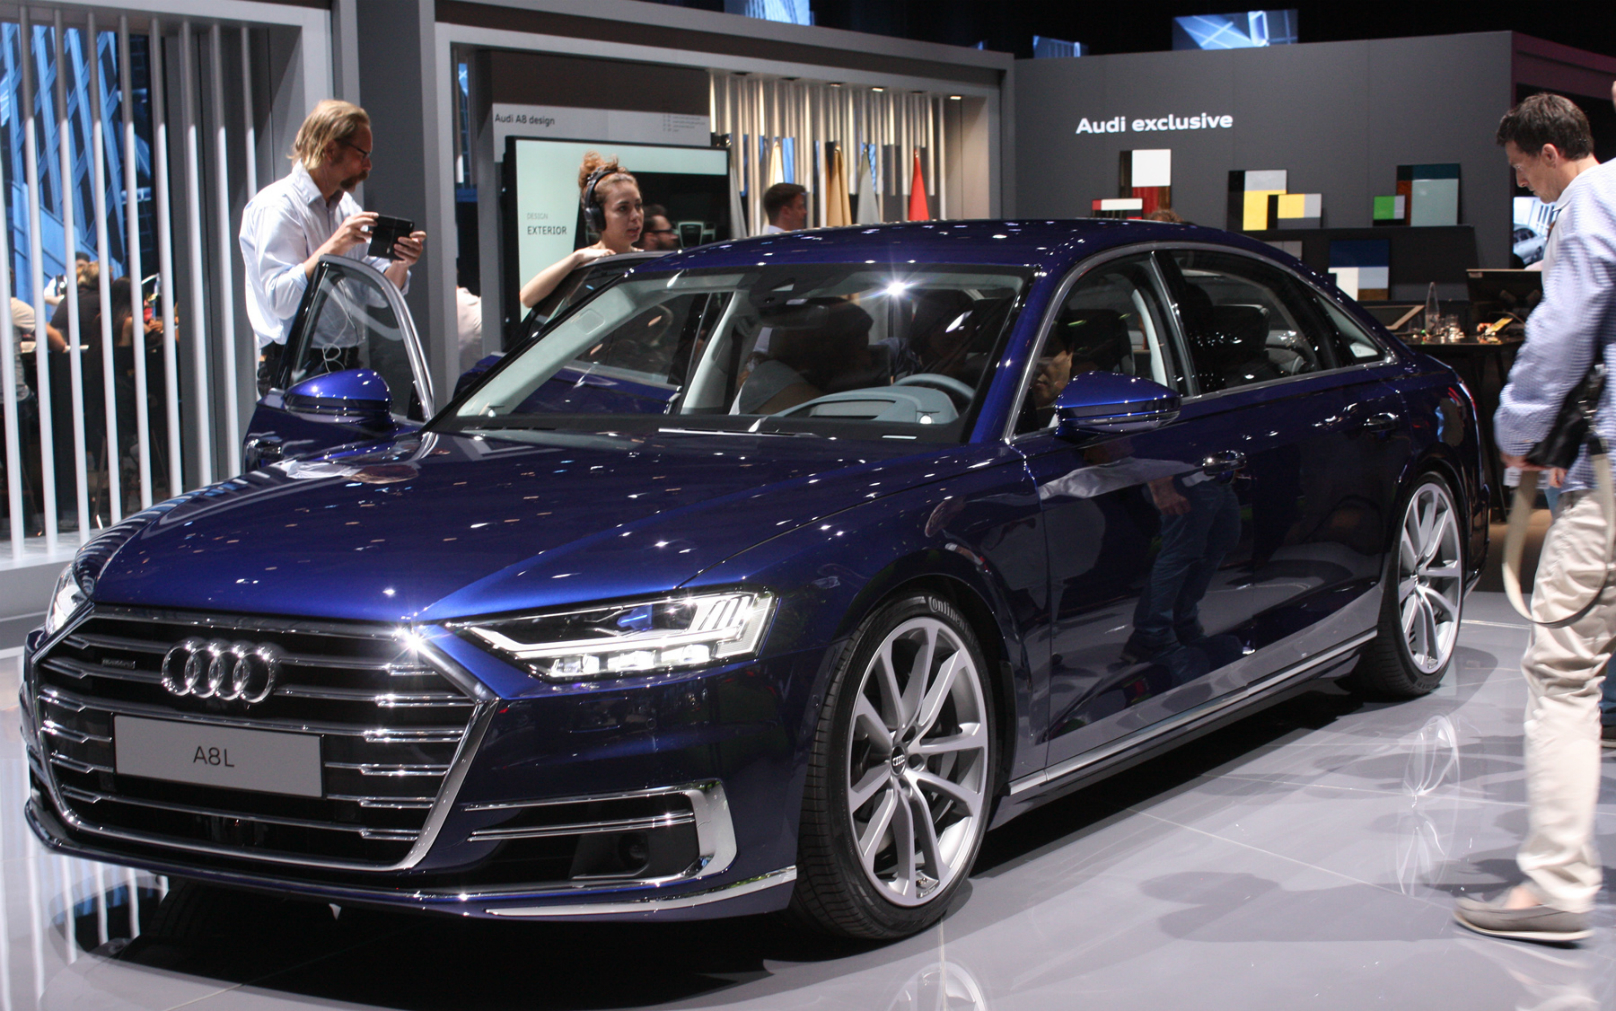 flagship A8 sedan